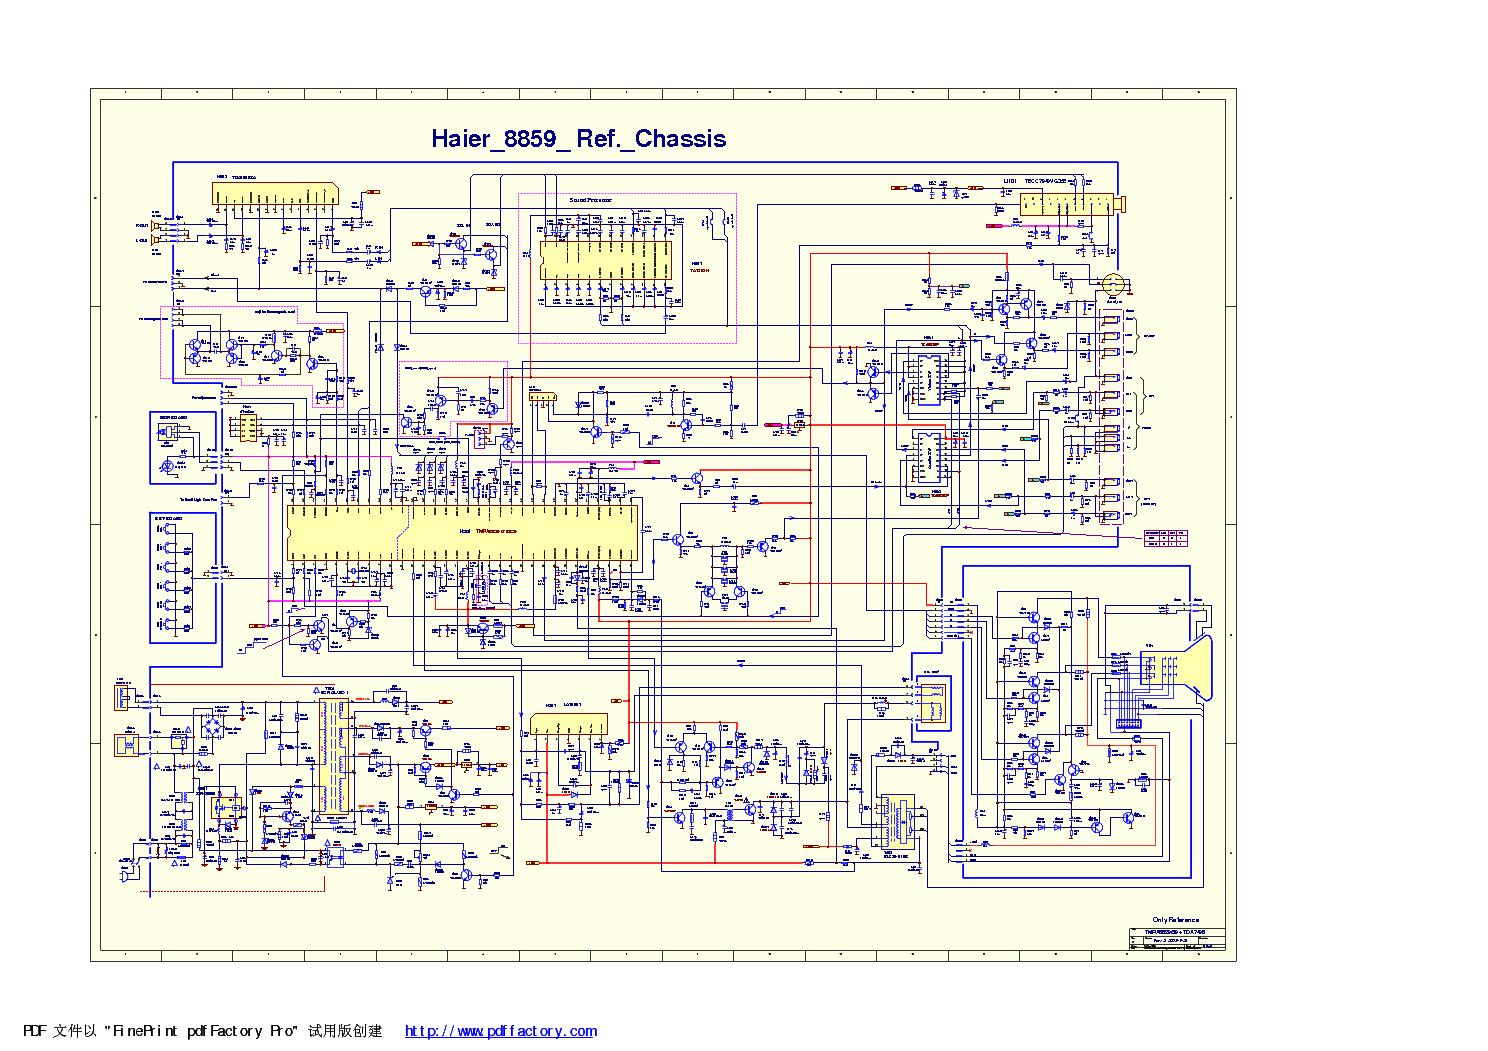 Схема тв эленберг 2170